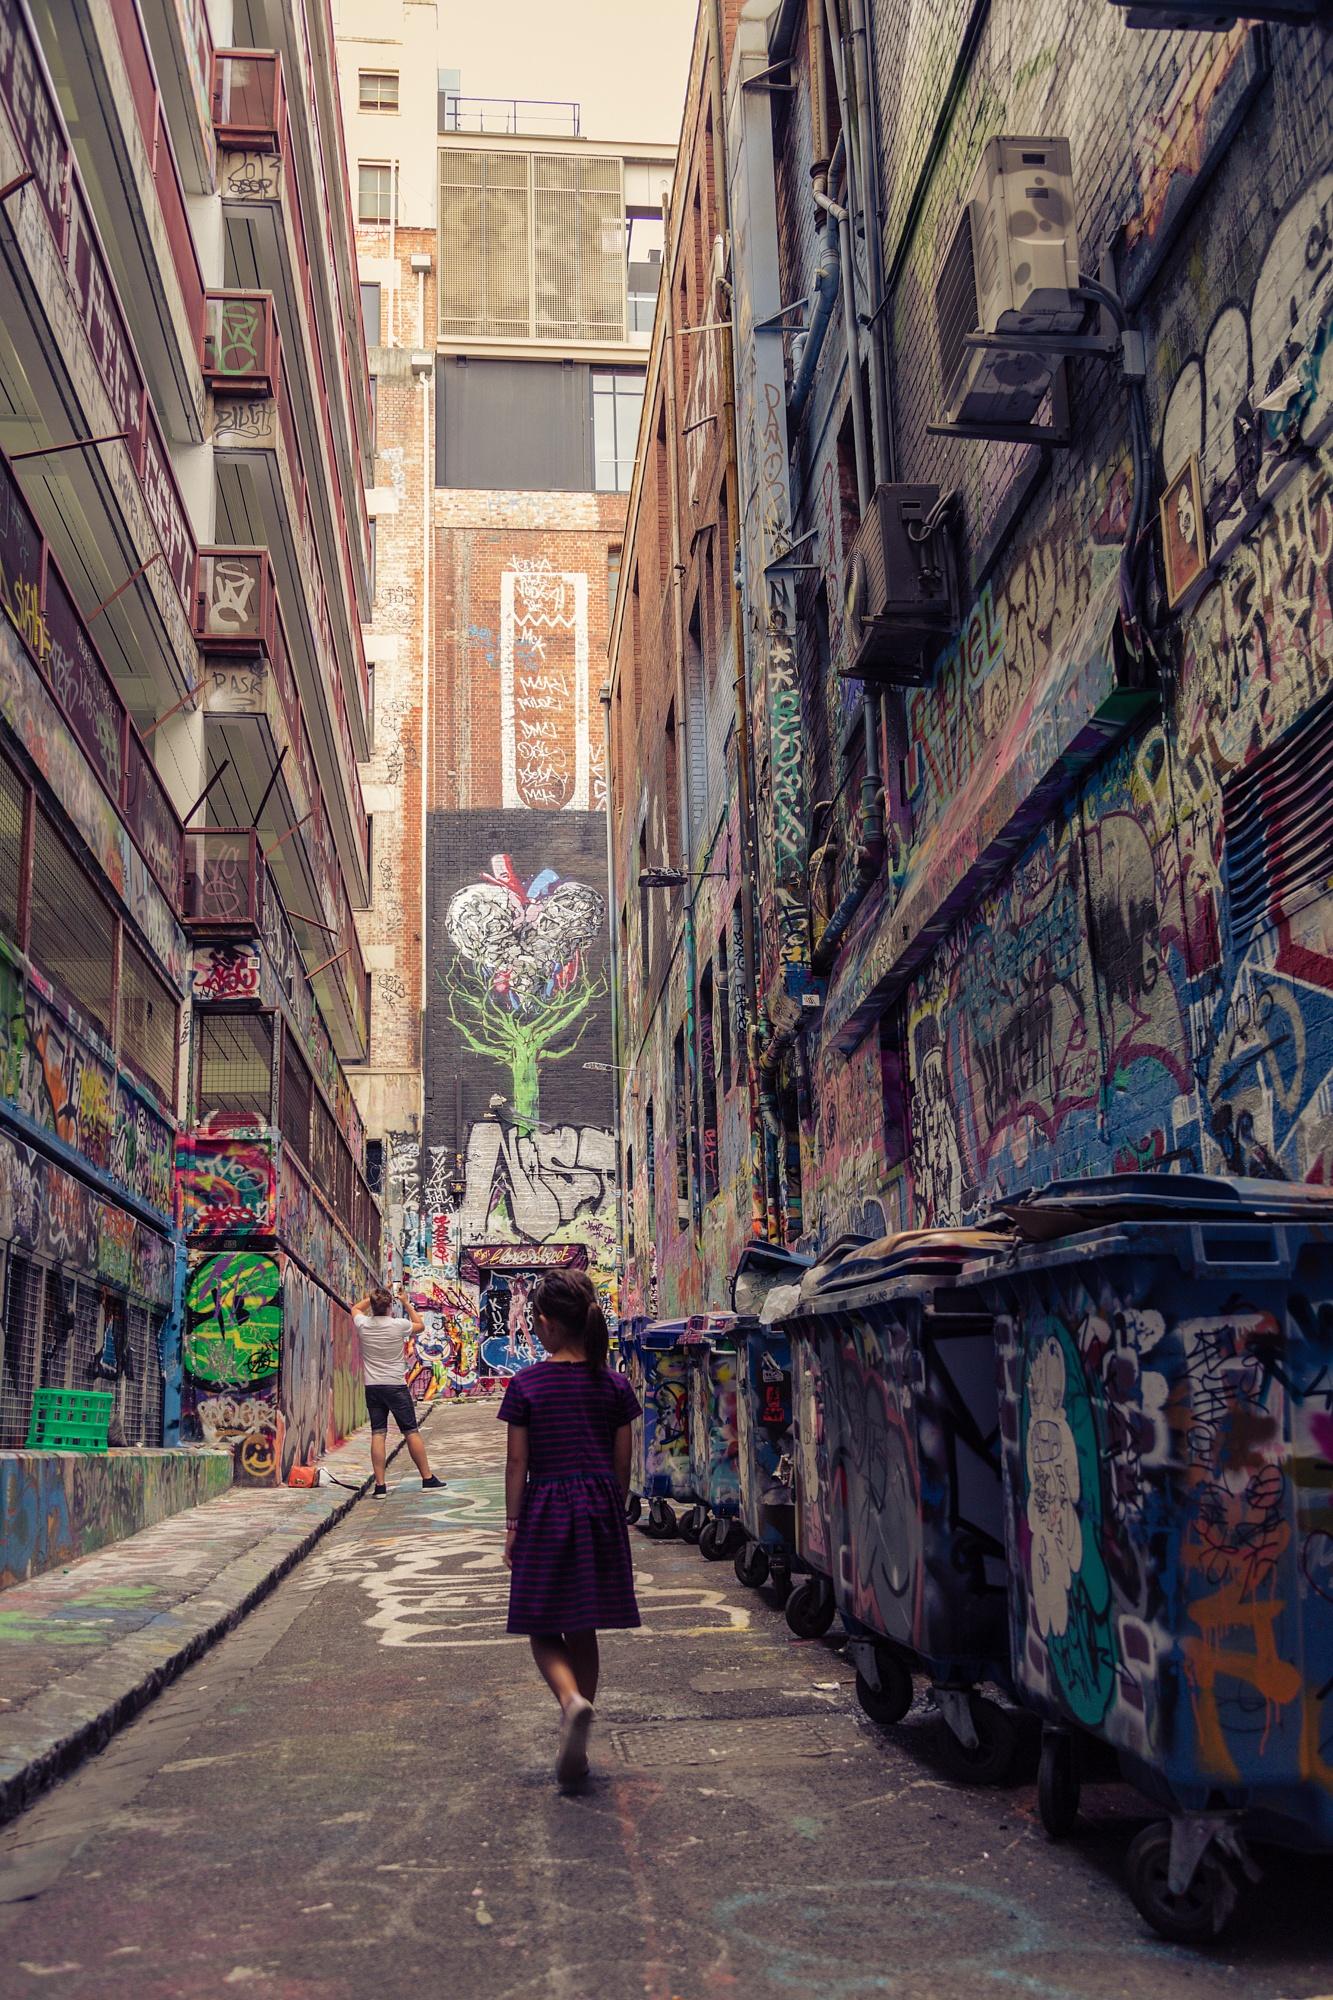 Graffiti lane by VeronicaSavitrie